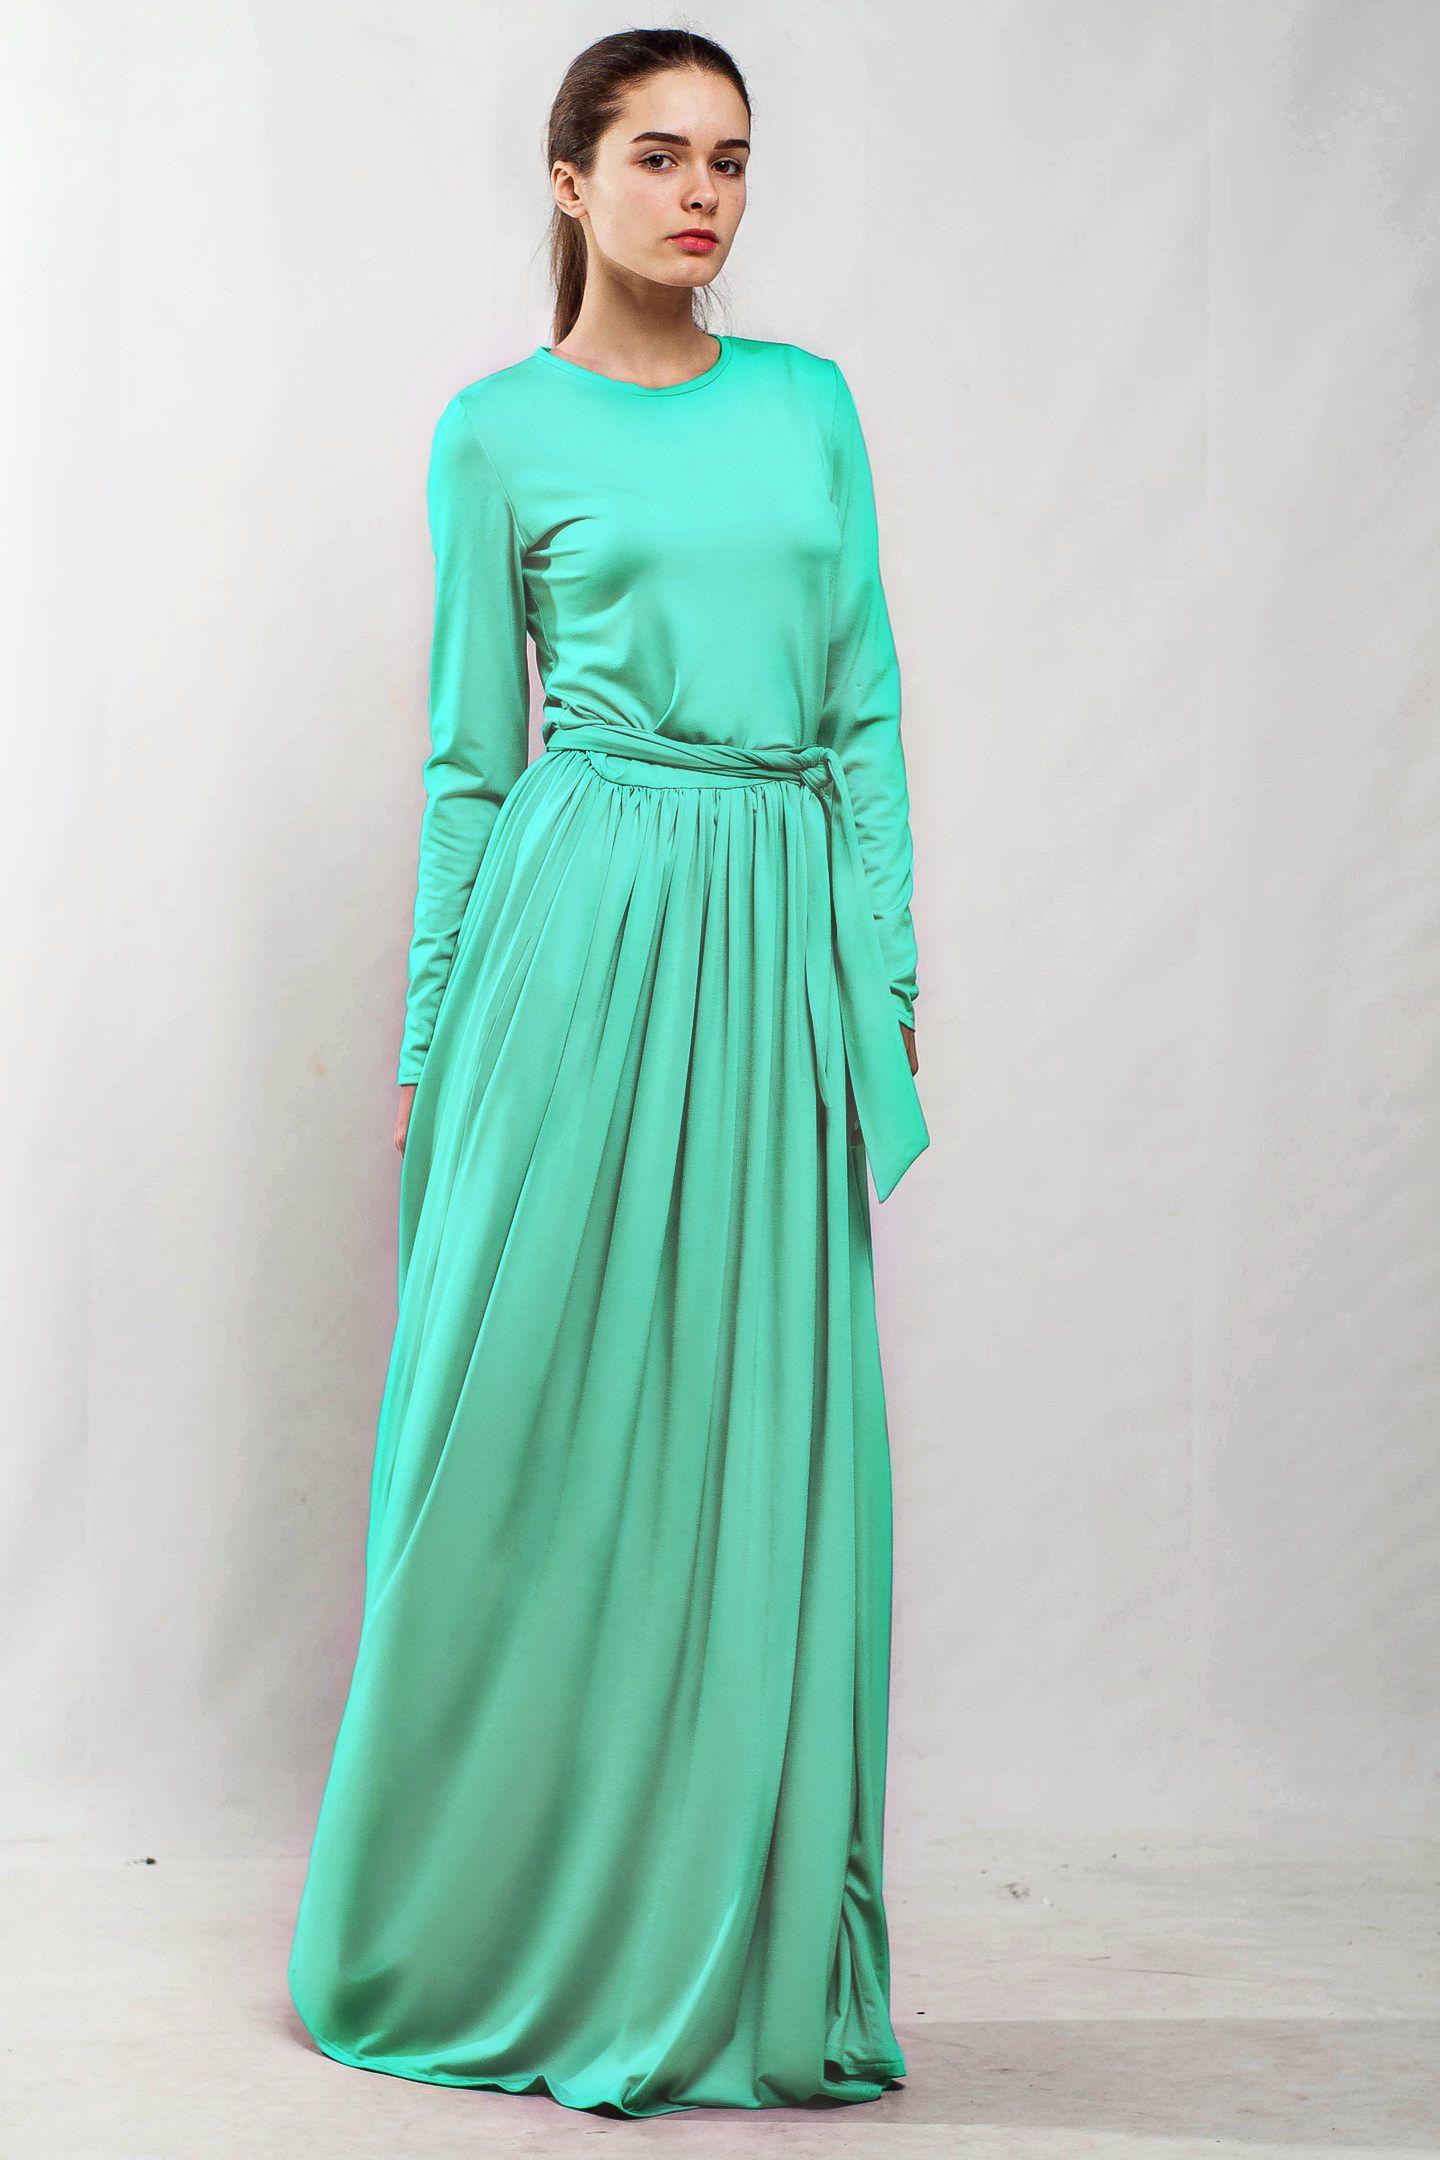 Mint Long Sleeve Cocktail Dresses